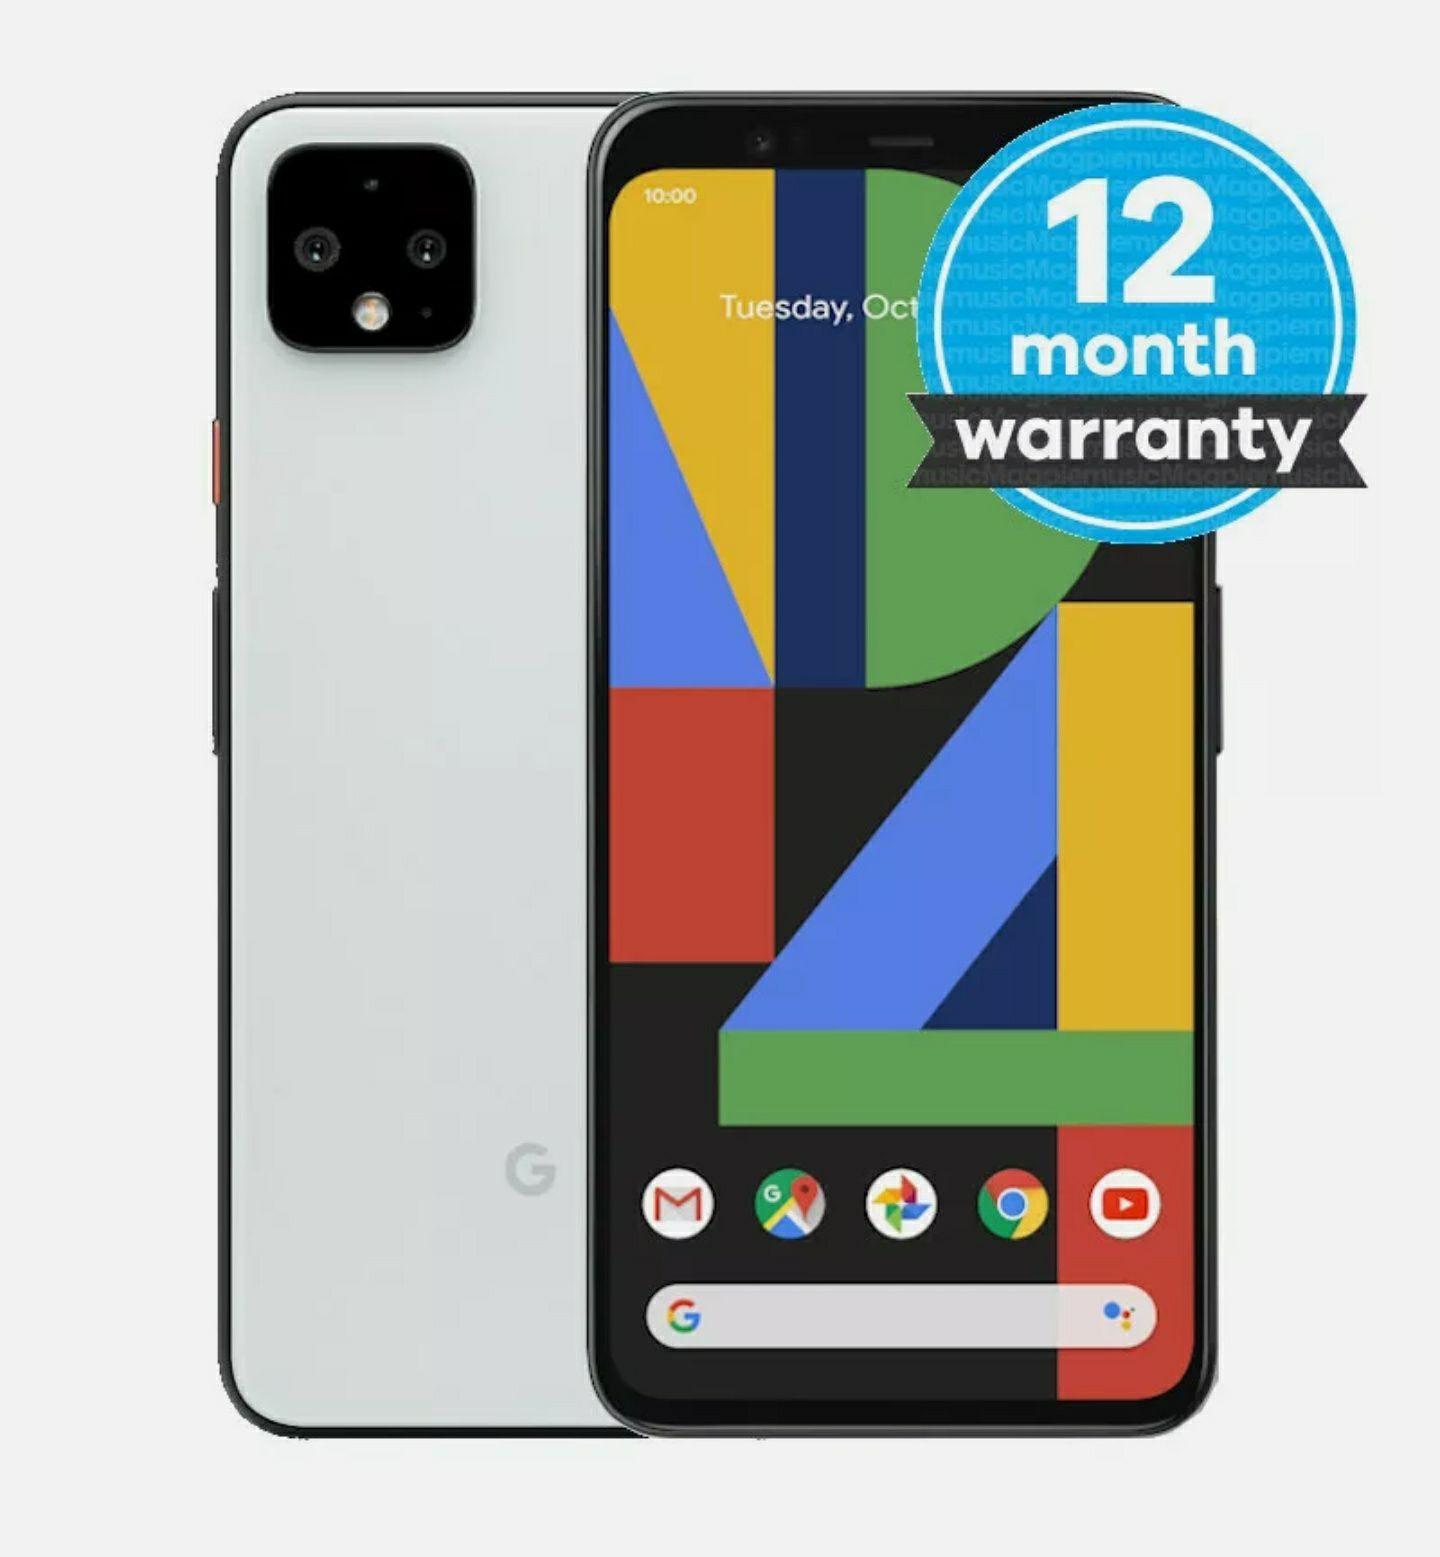 Google Pixel 4 64GB Unlocked Smartphone In Refurbished Good Condition Black / White - £281.51 @ Music Magpie / Ebay